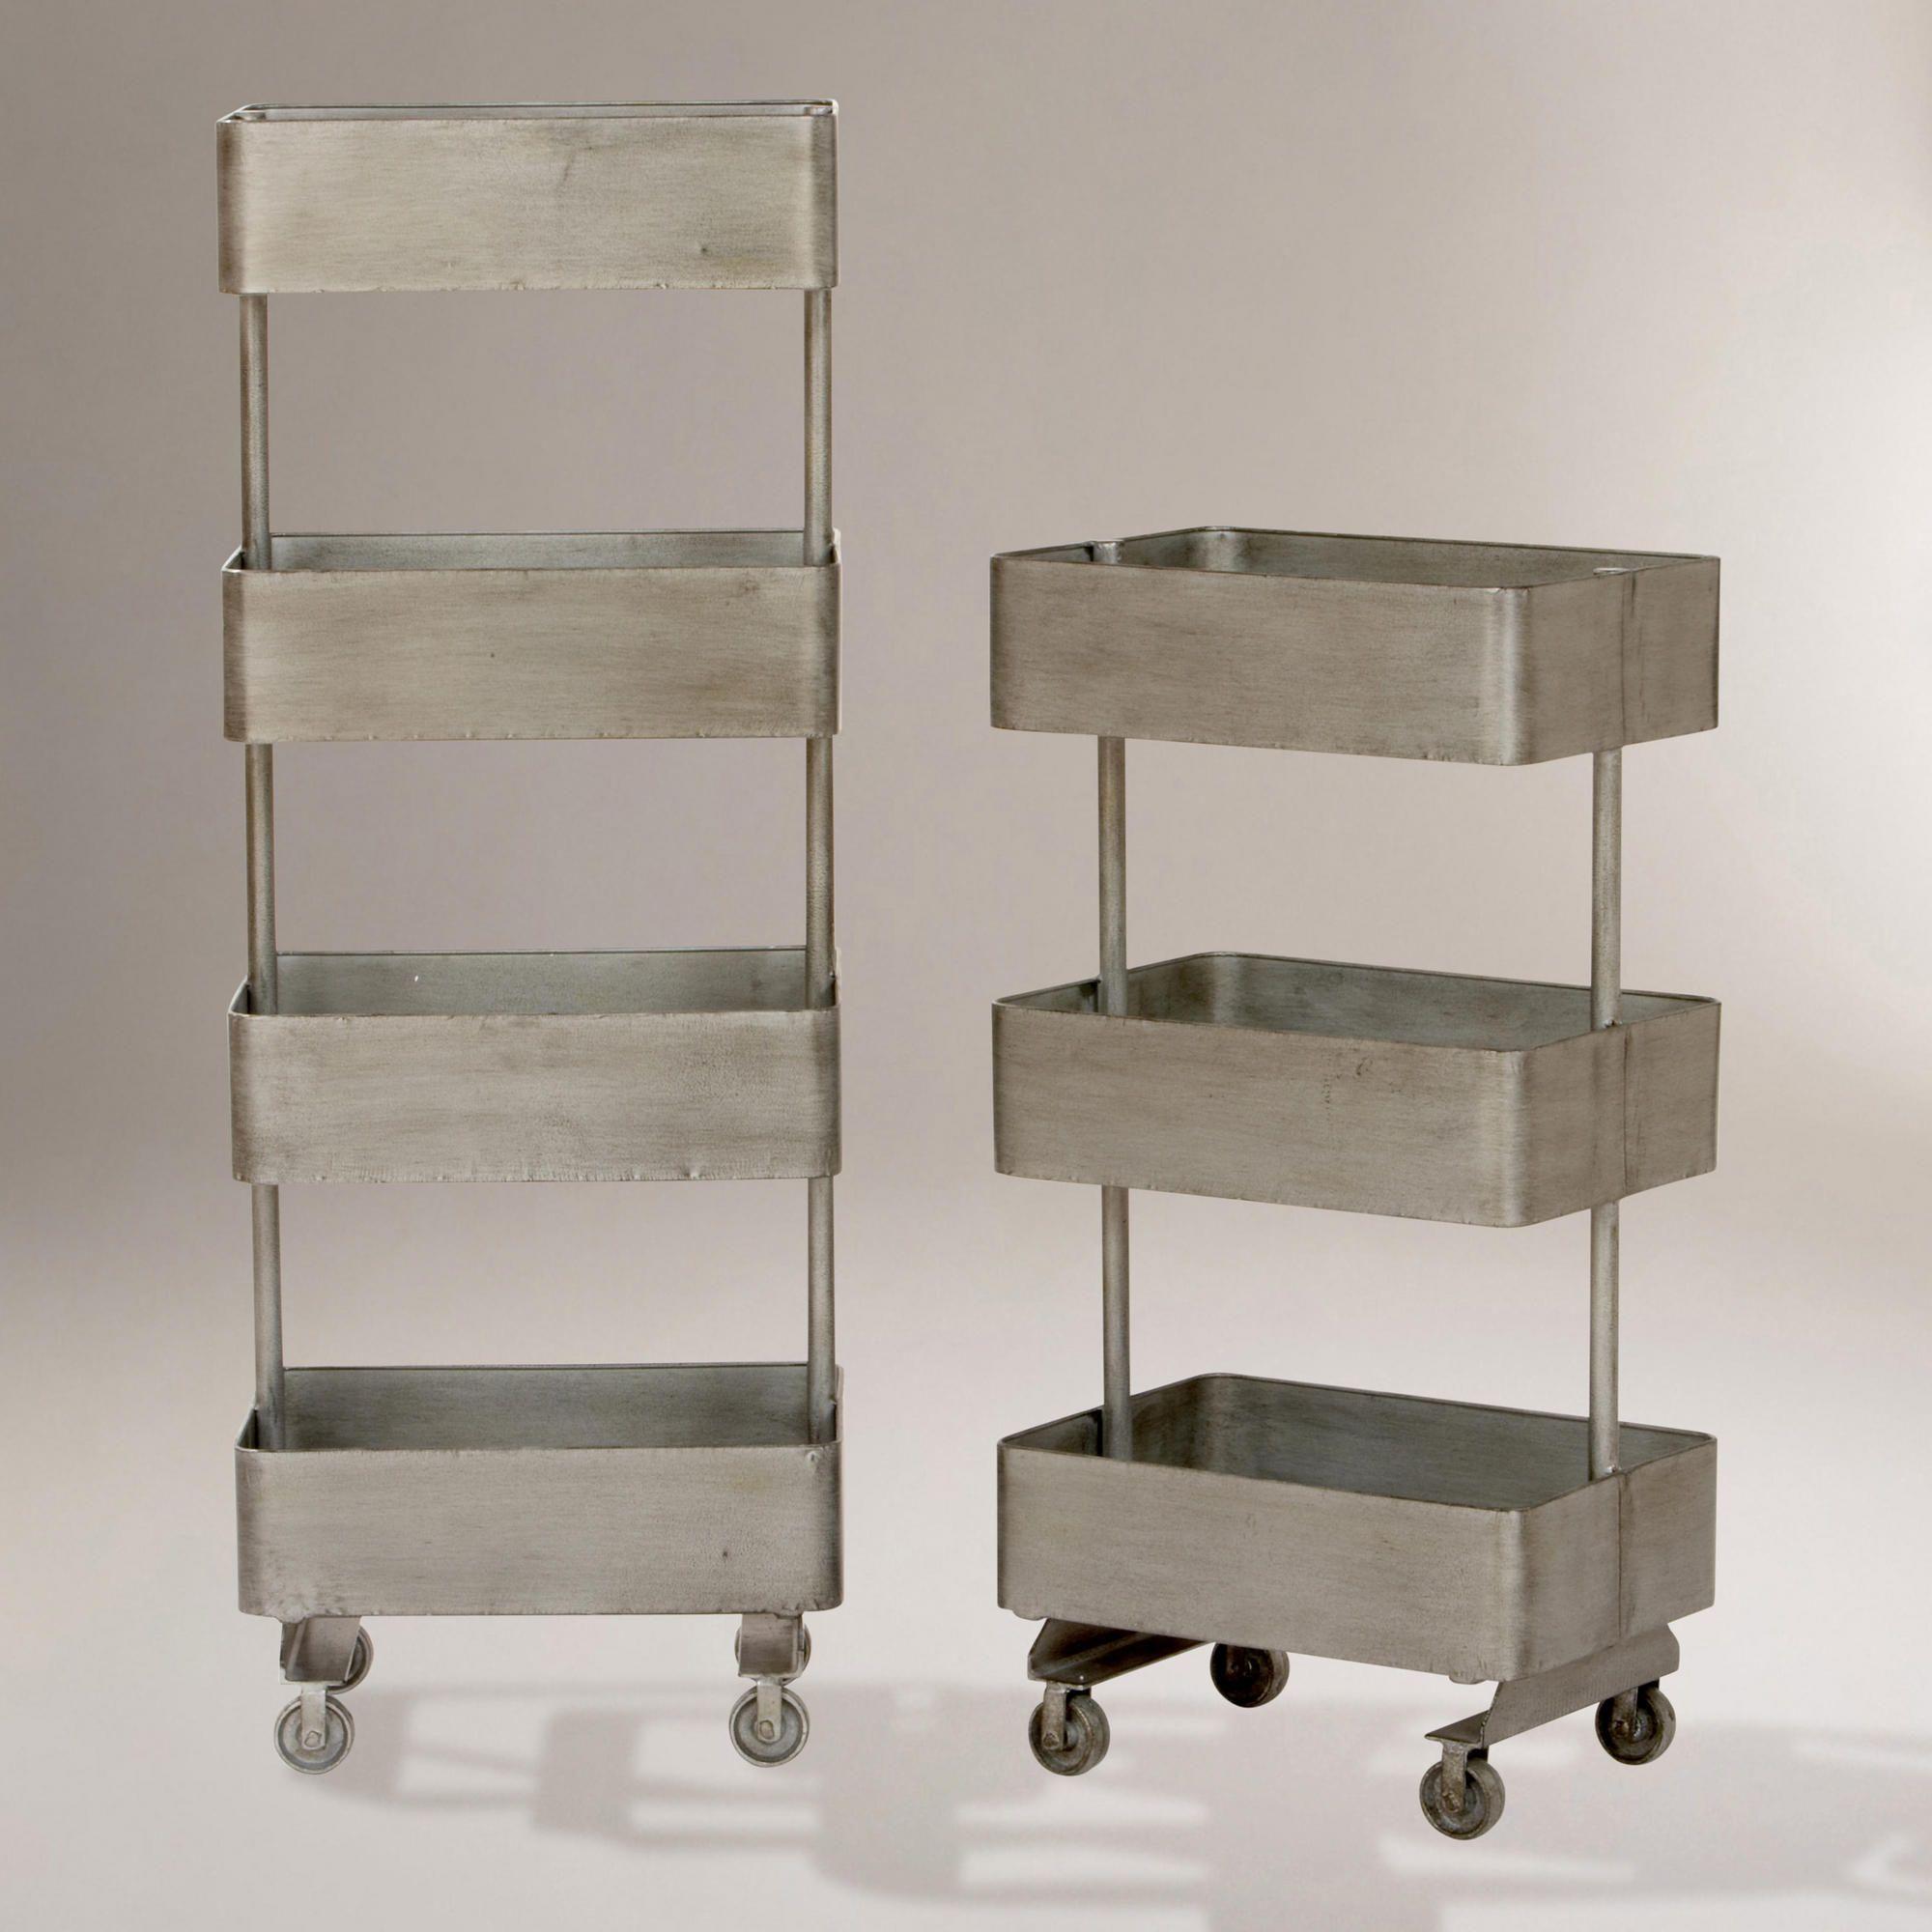 Jayden Metal Shelf Units | World Market